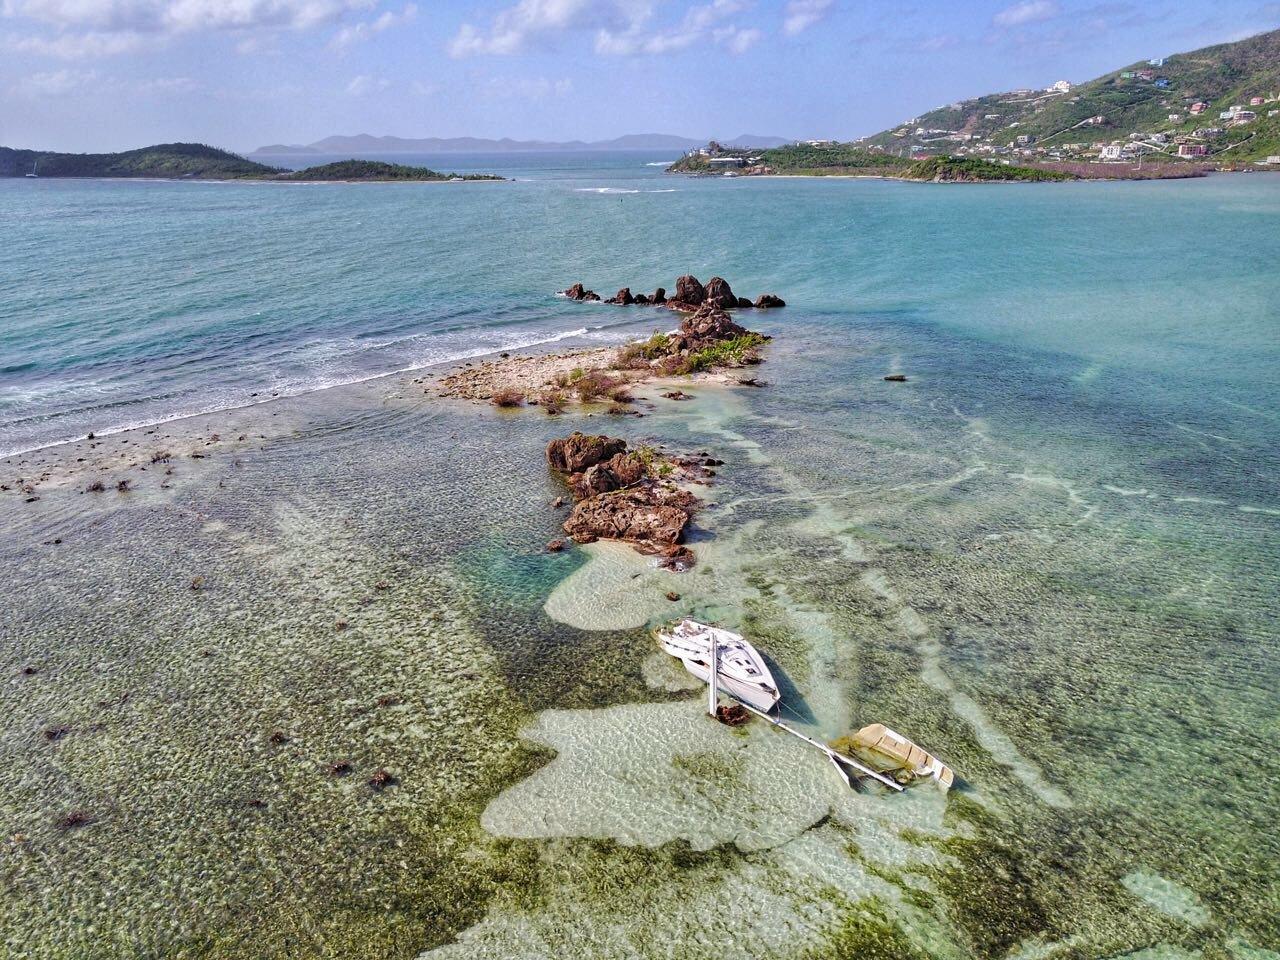 East End, Tortola - photo by Alton Bertie